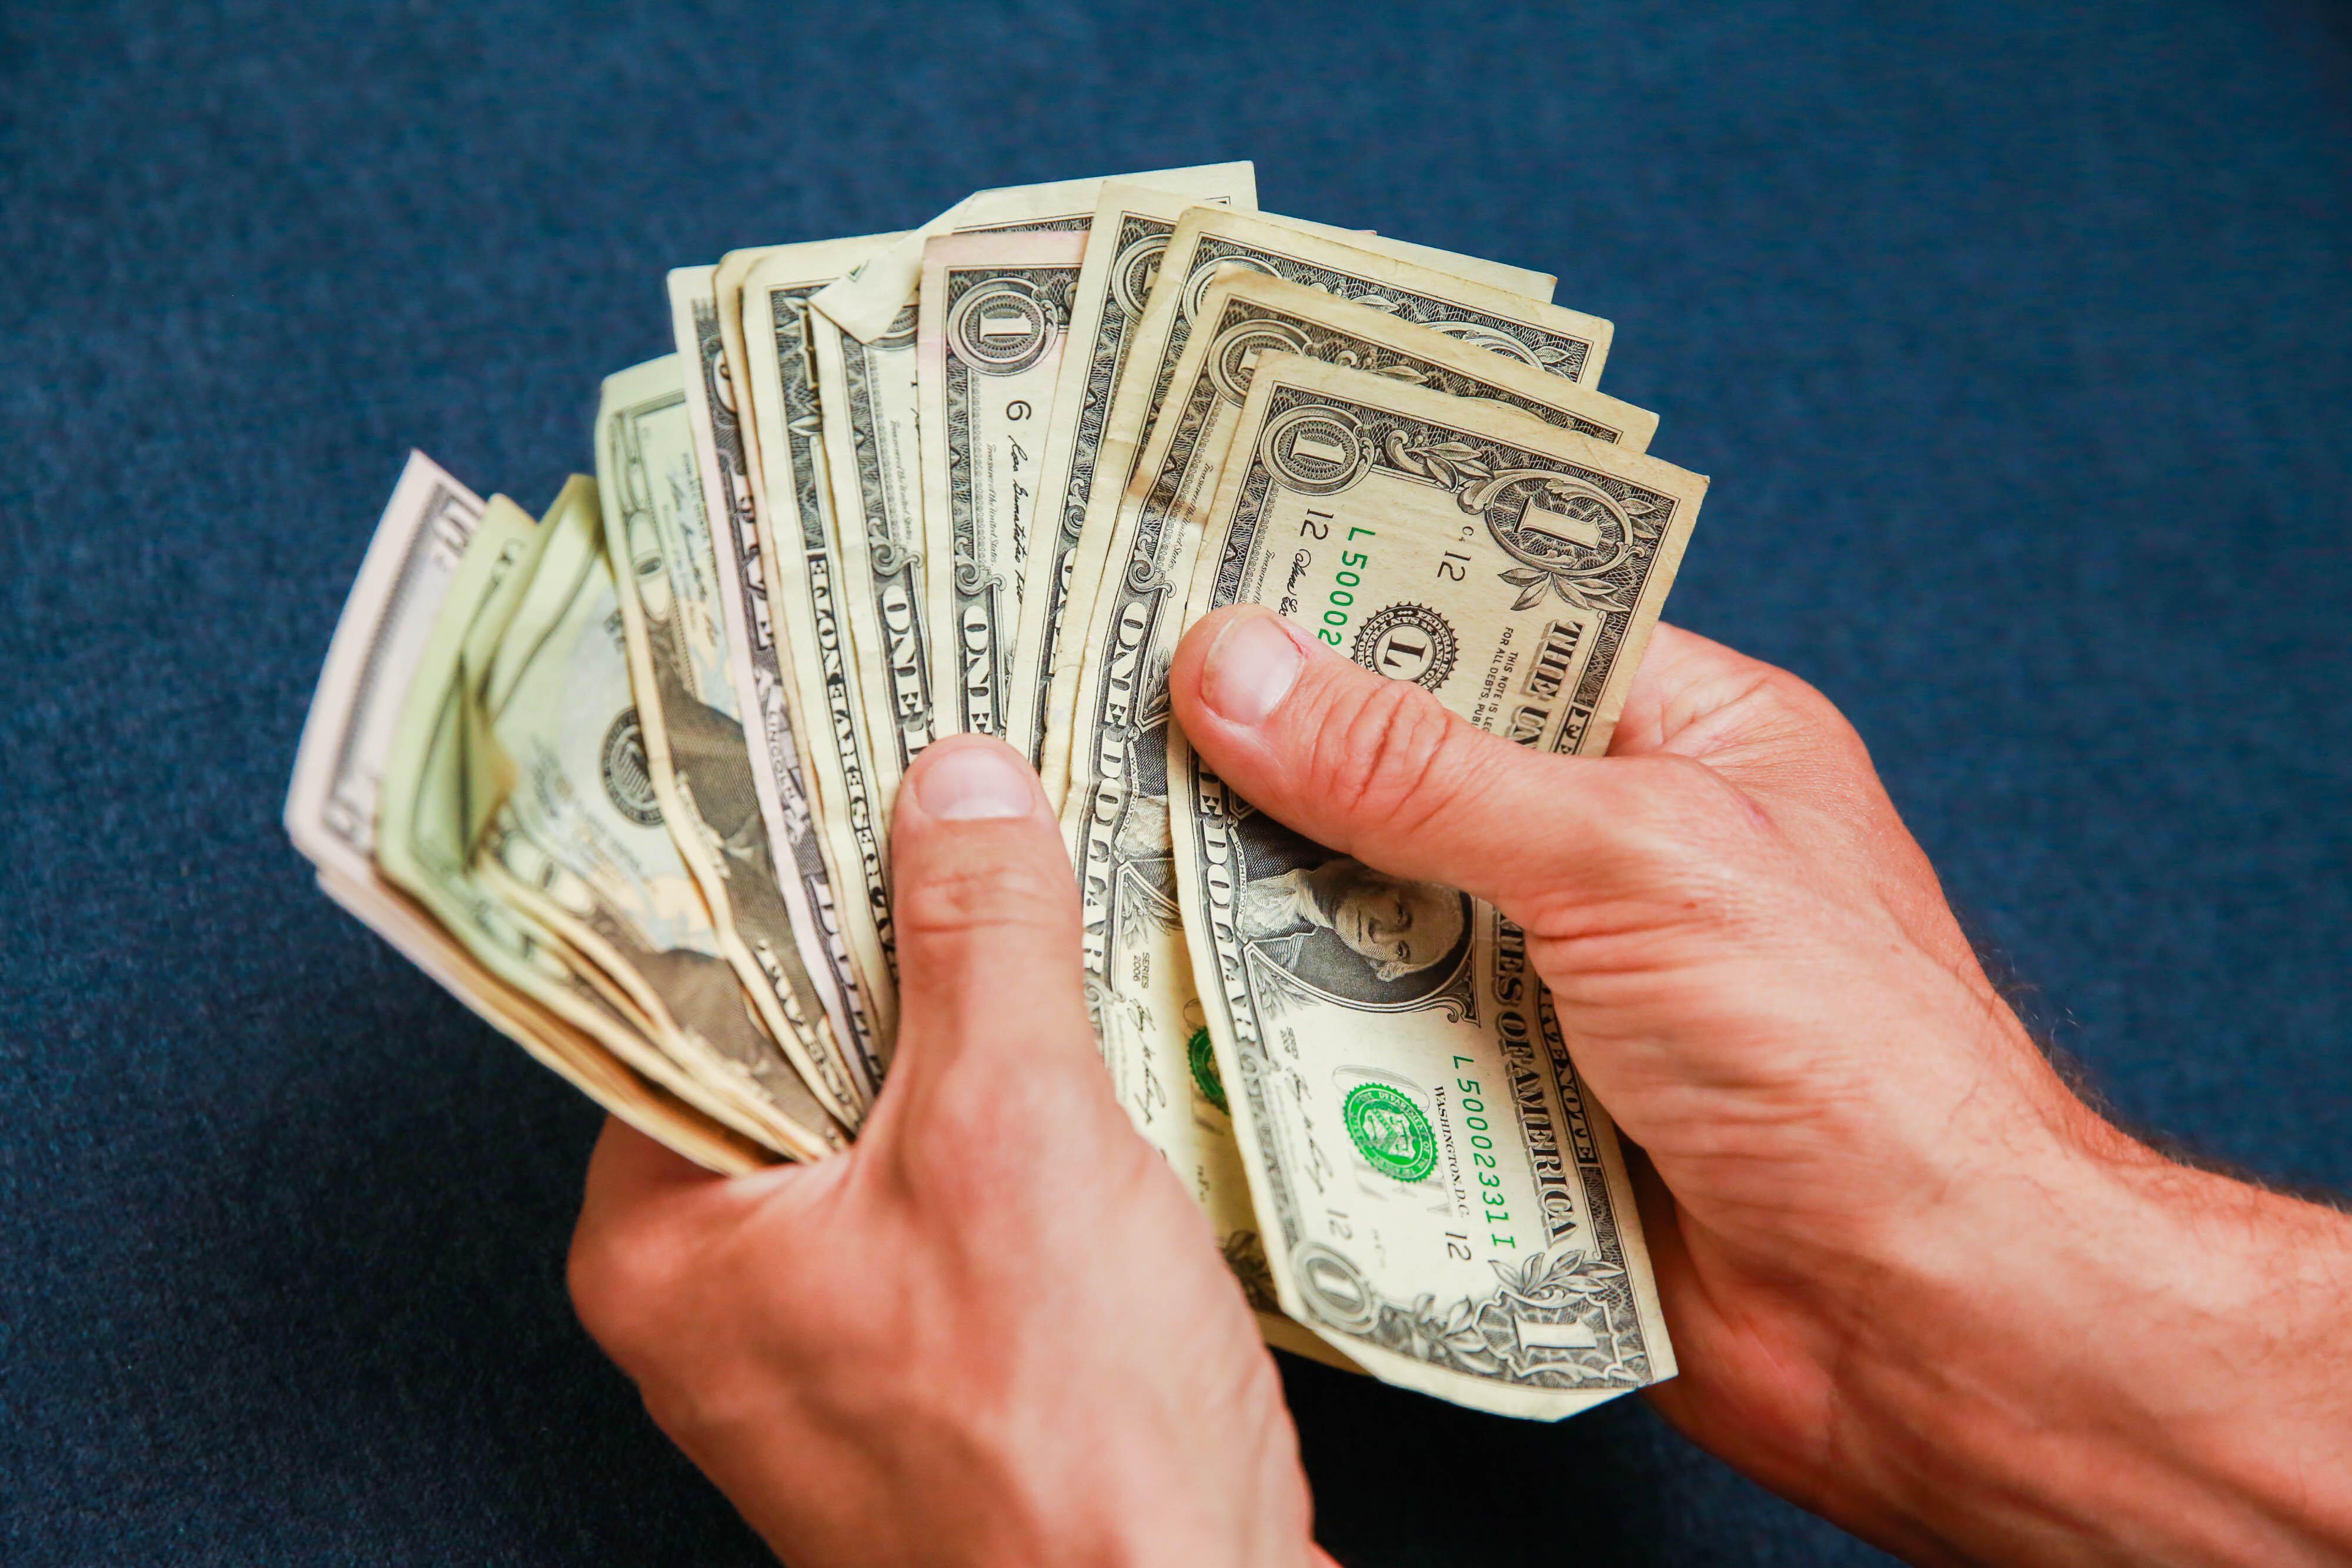 004-counting-cash-money-dollar-bills-hands-blue-background-stimulus-2020